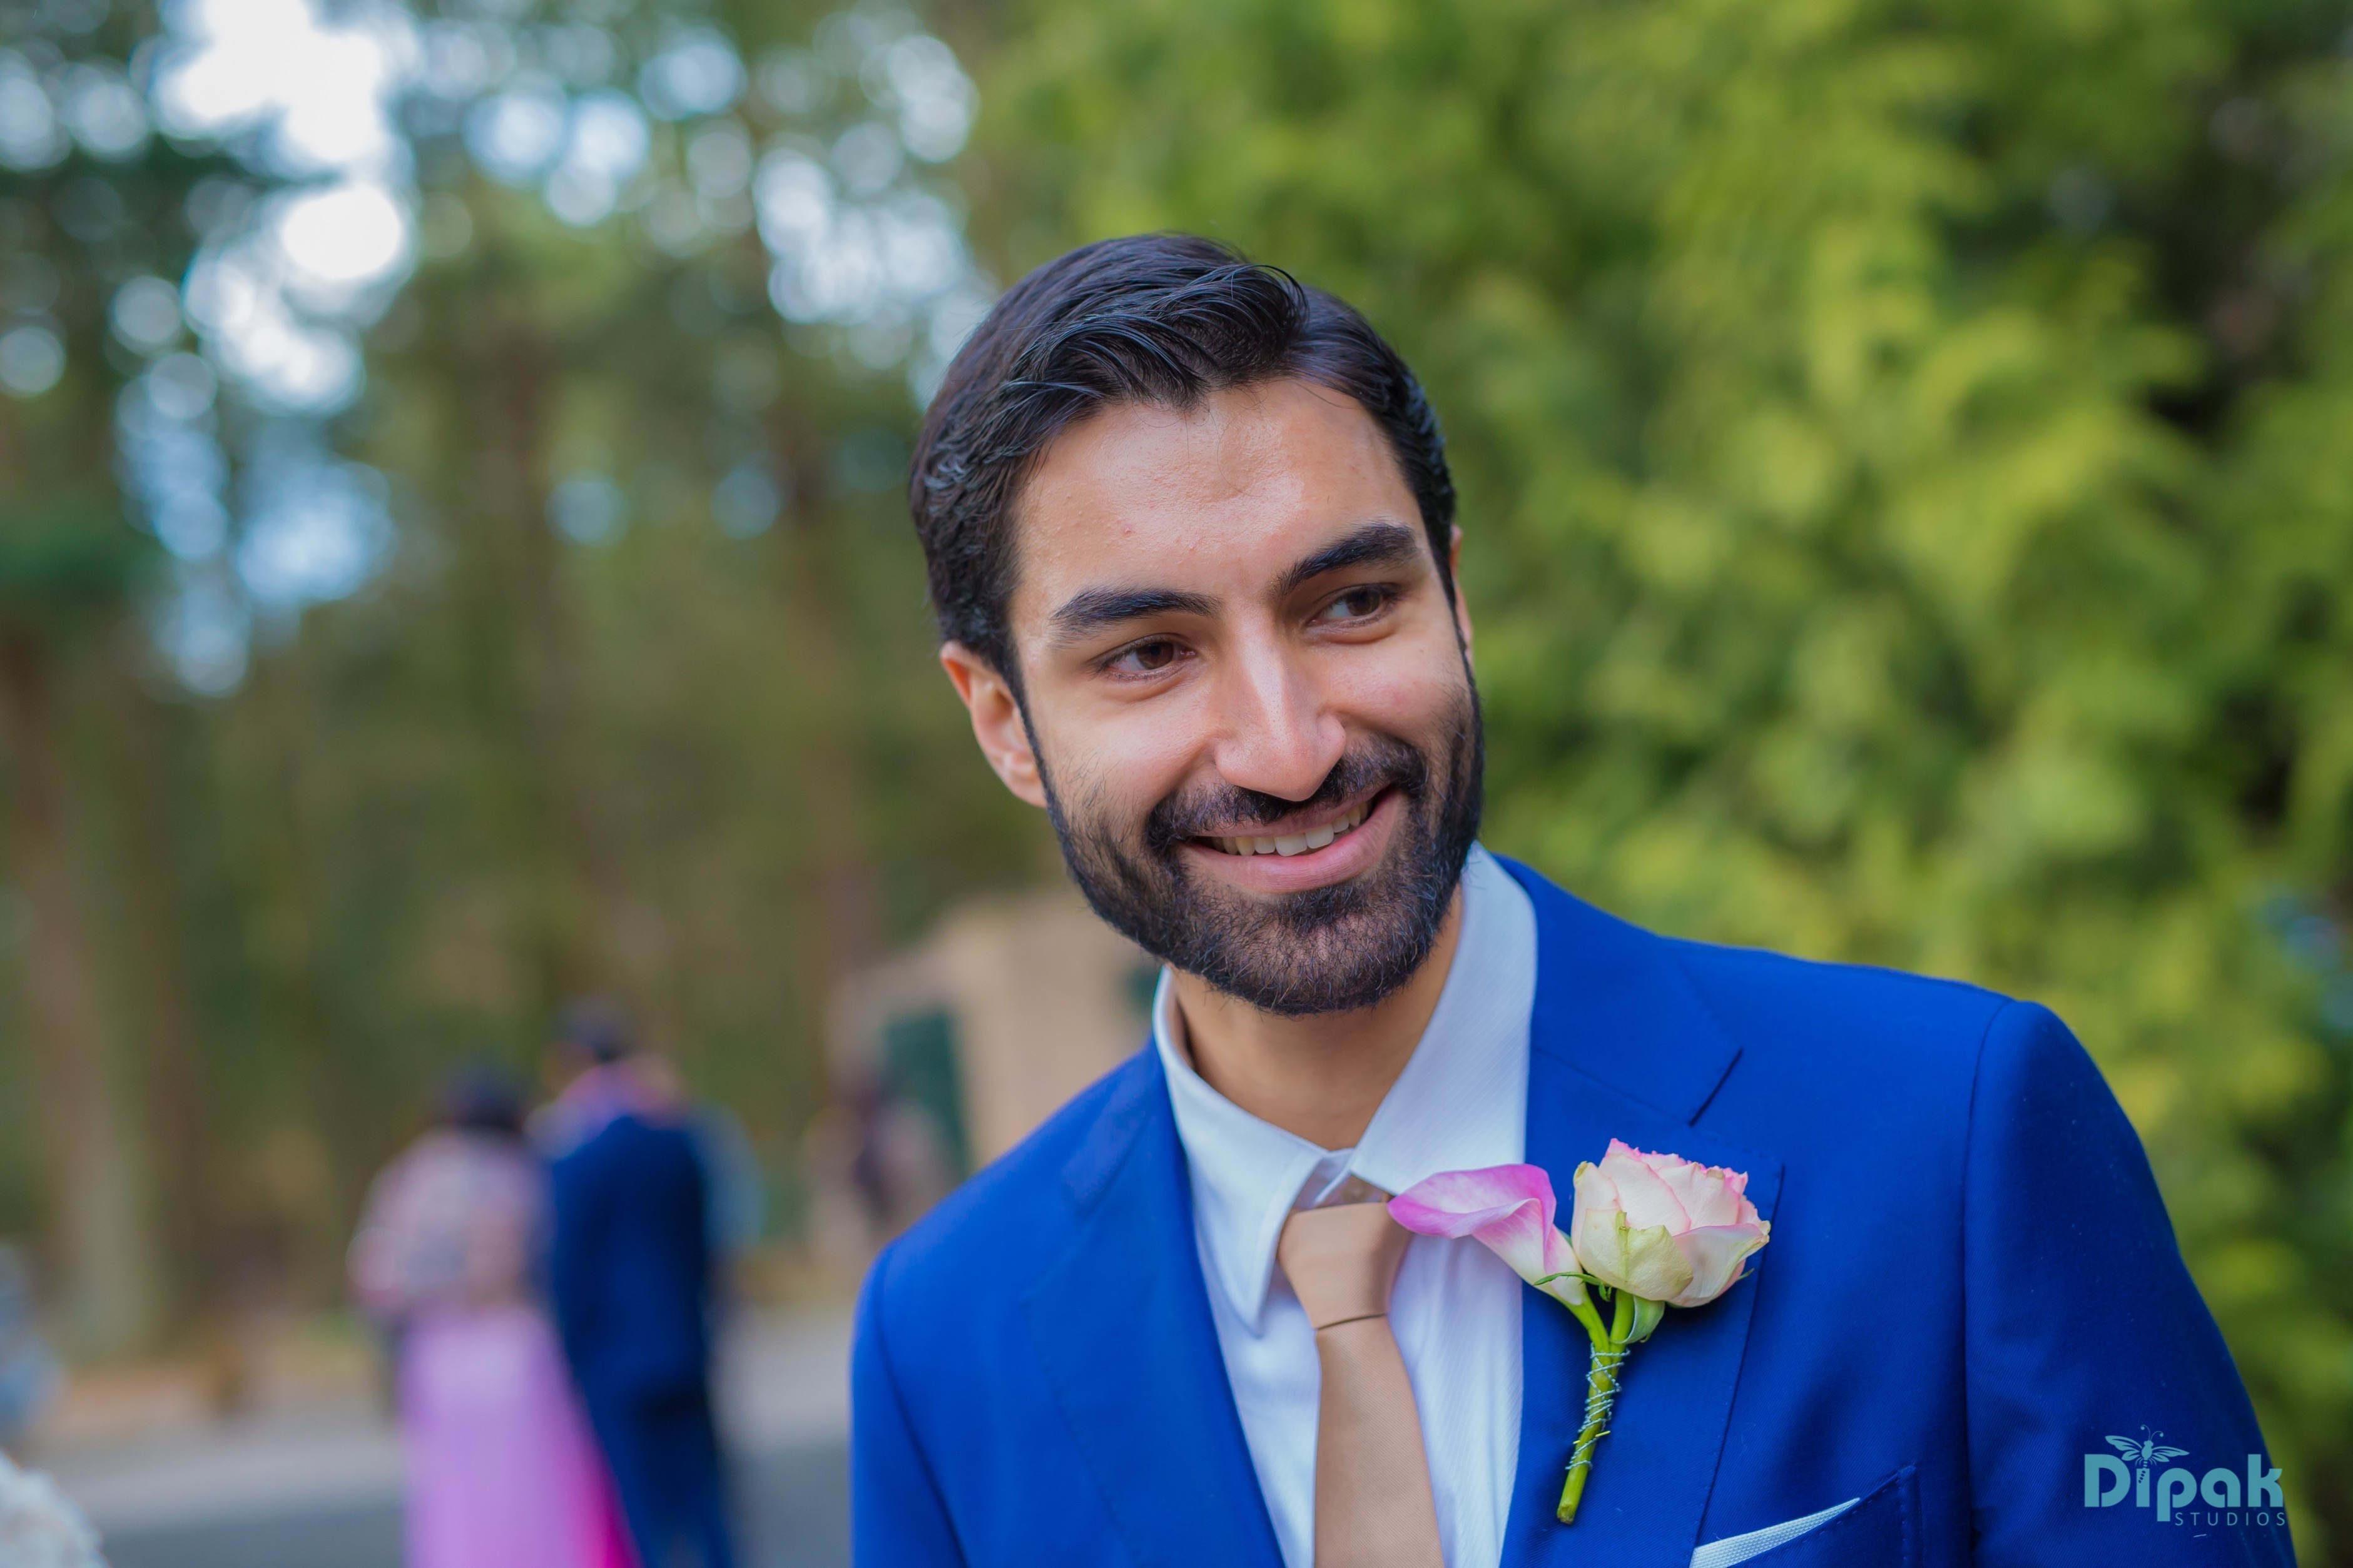 the dashing groom!:dipak colour lab pvt ltd, sabyasachi couture pvt ltd, anushree reddy